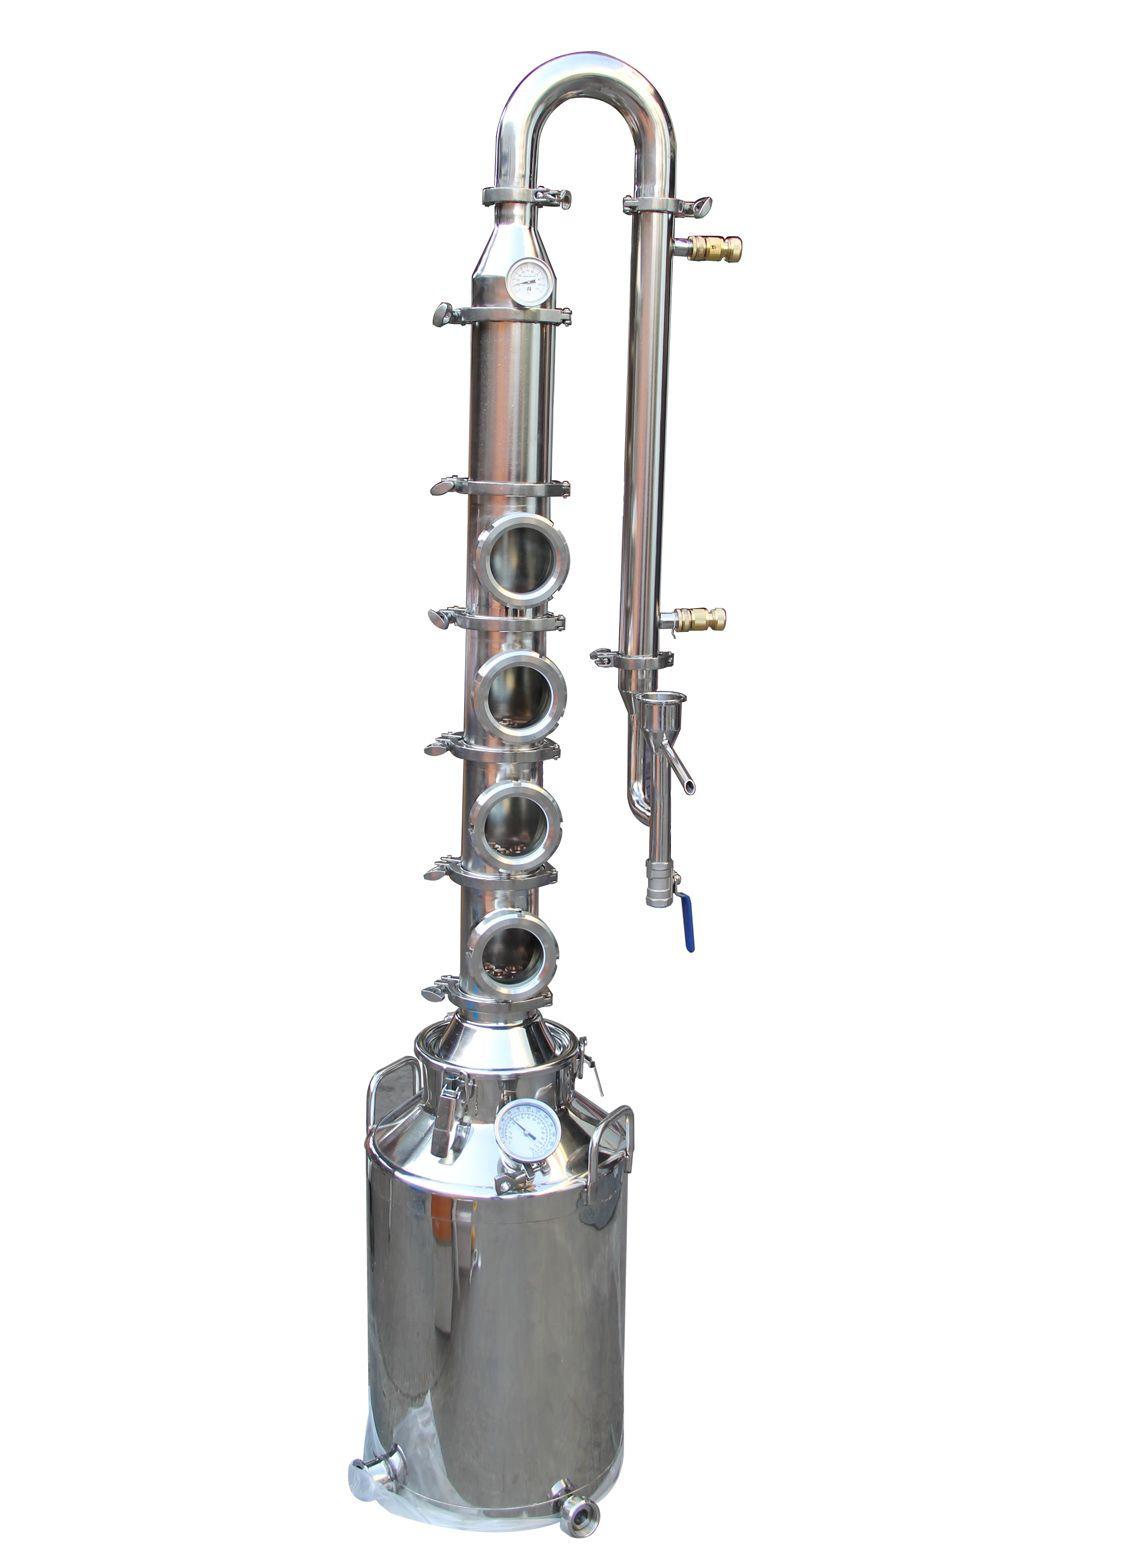 50L/100L\200L stainless steel 304 distillation column Home alcohol distiller/Small distillation equipment/Moonshine alcohol distillery